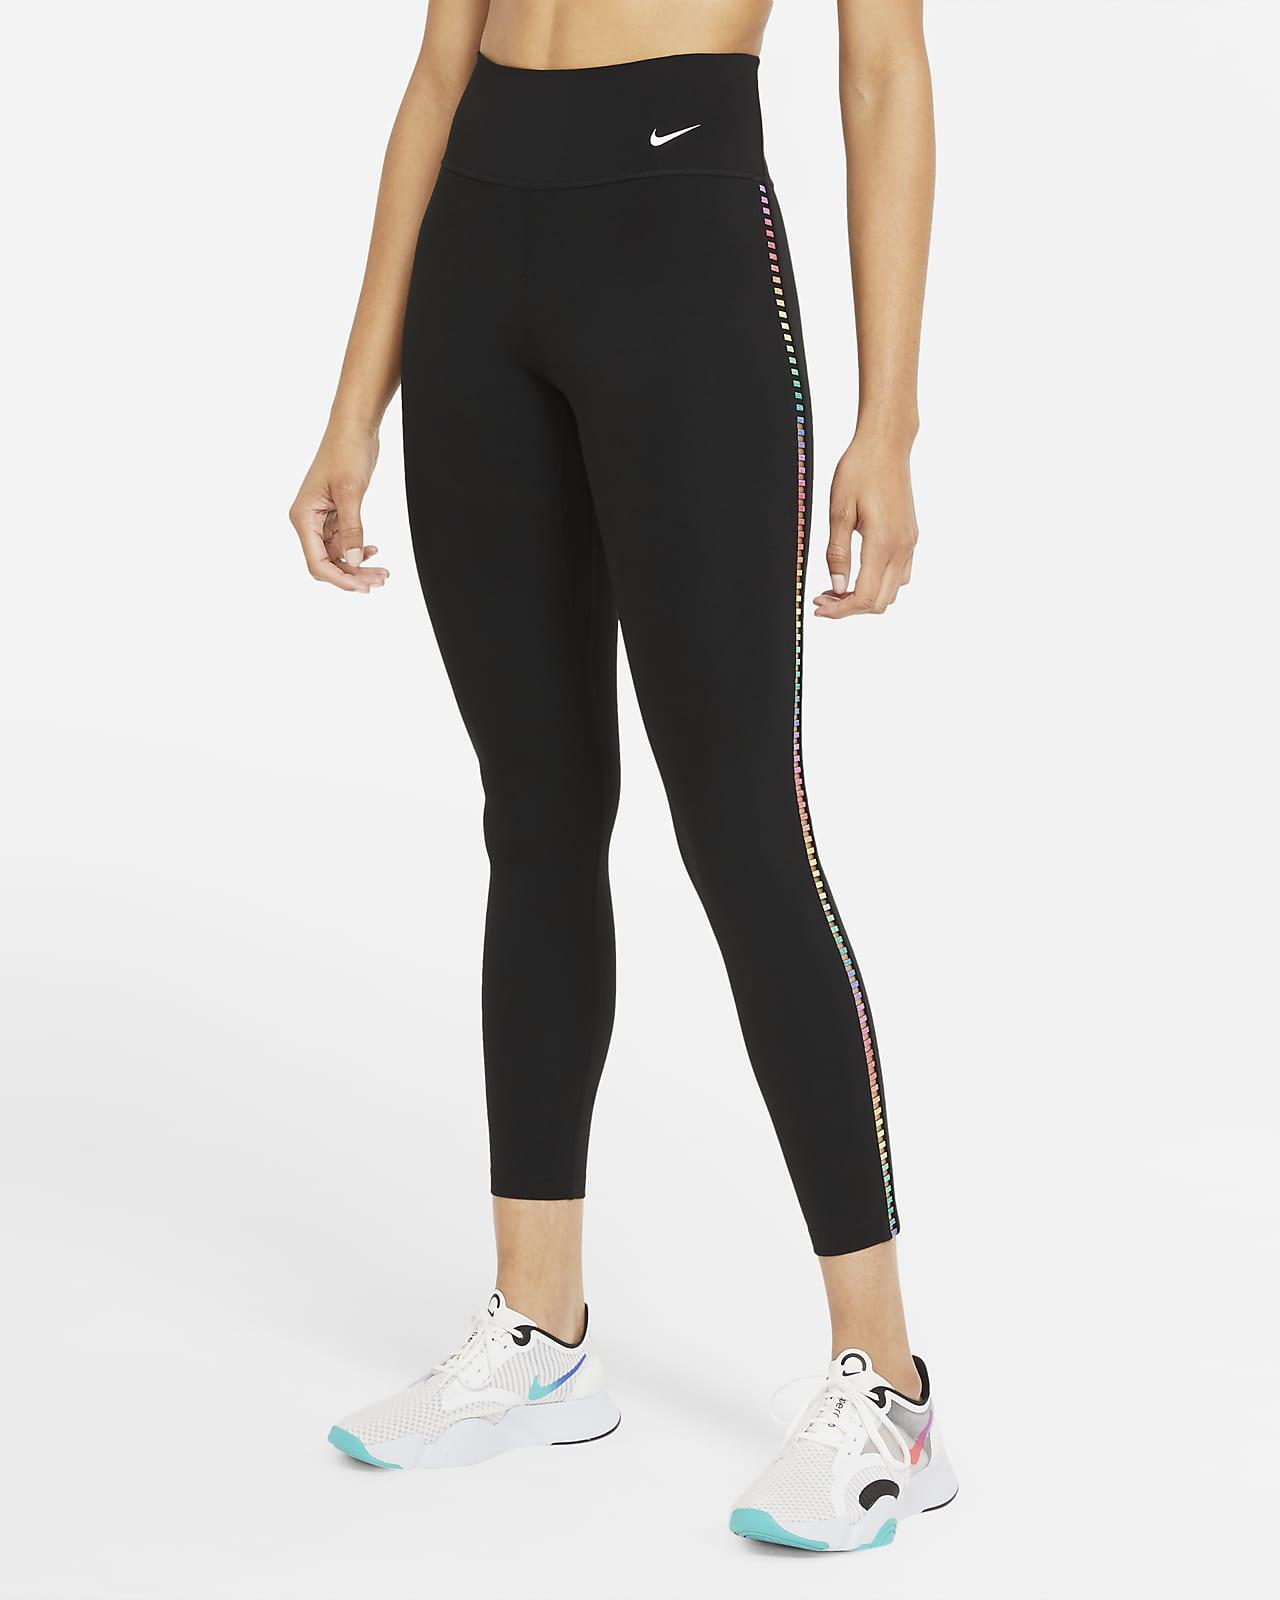 Nike One Rainbow Ladder 7/8-Leggings für Damen